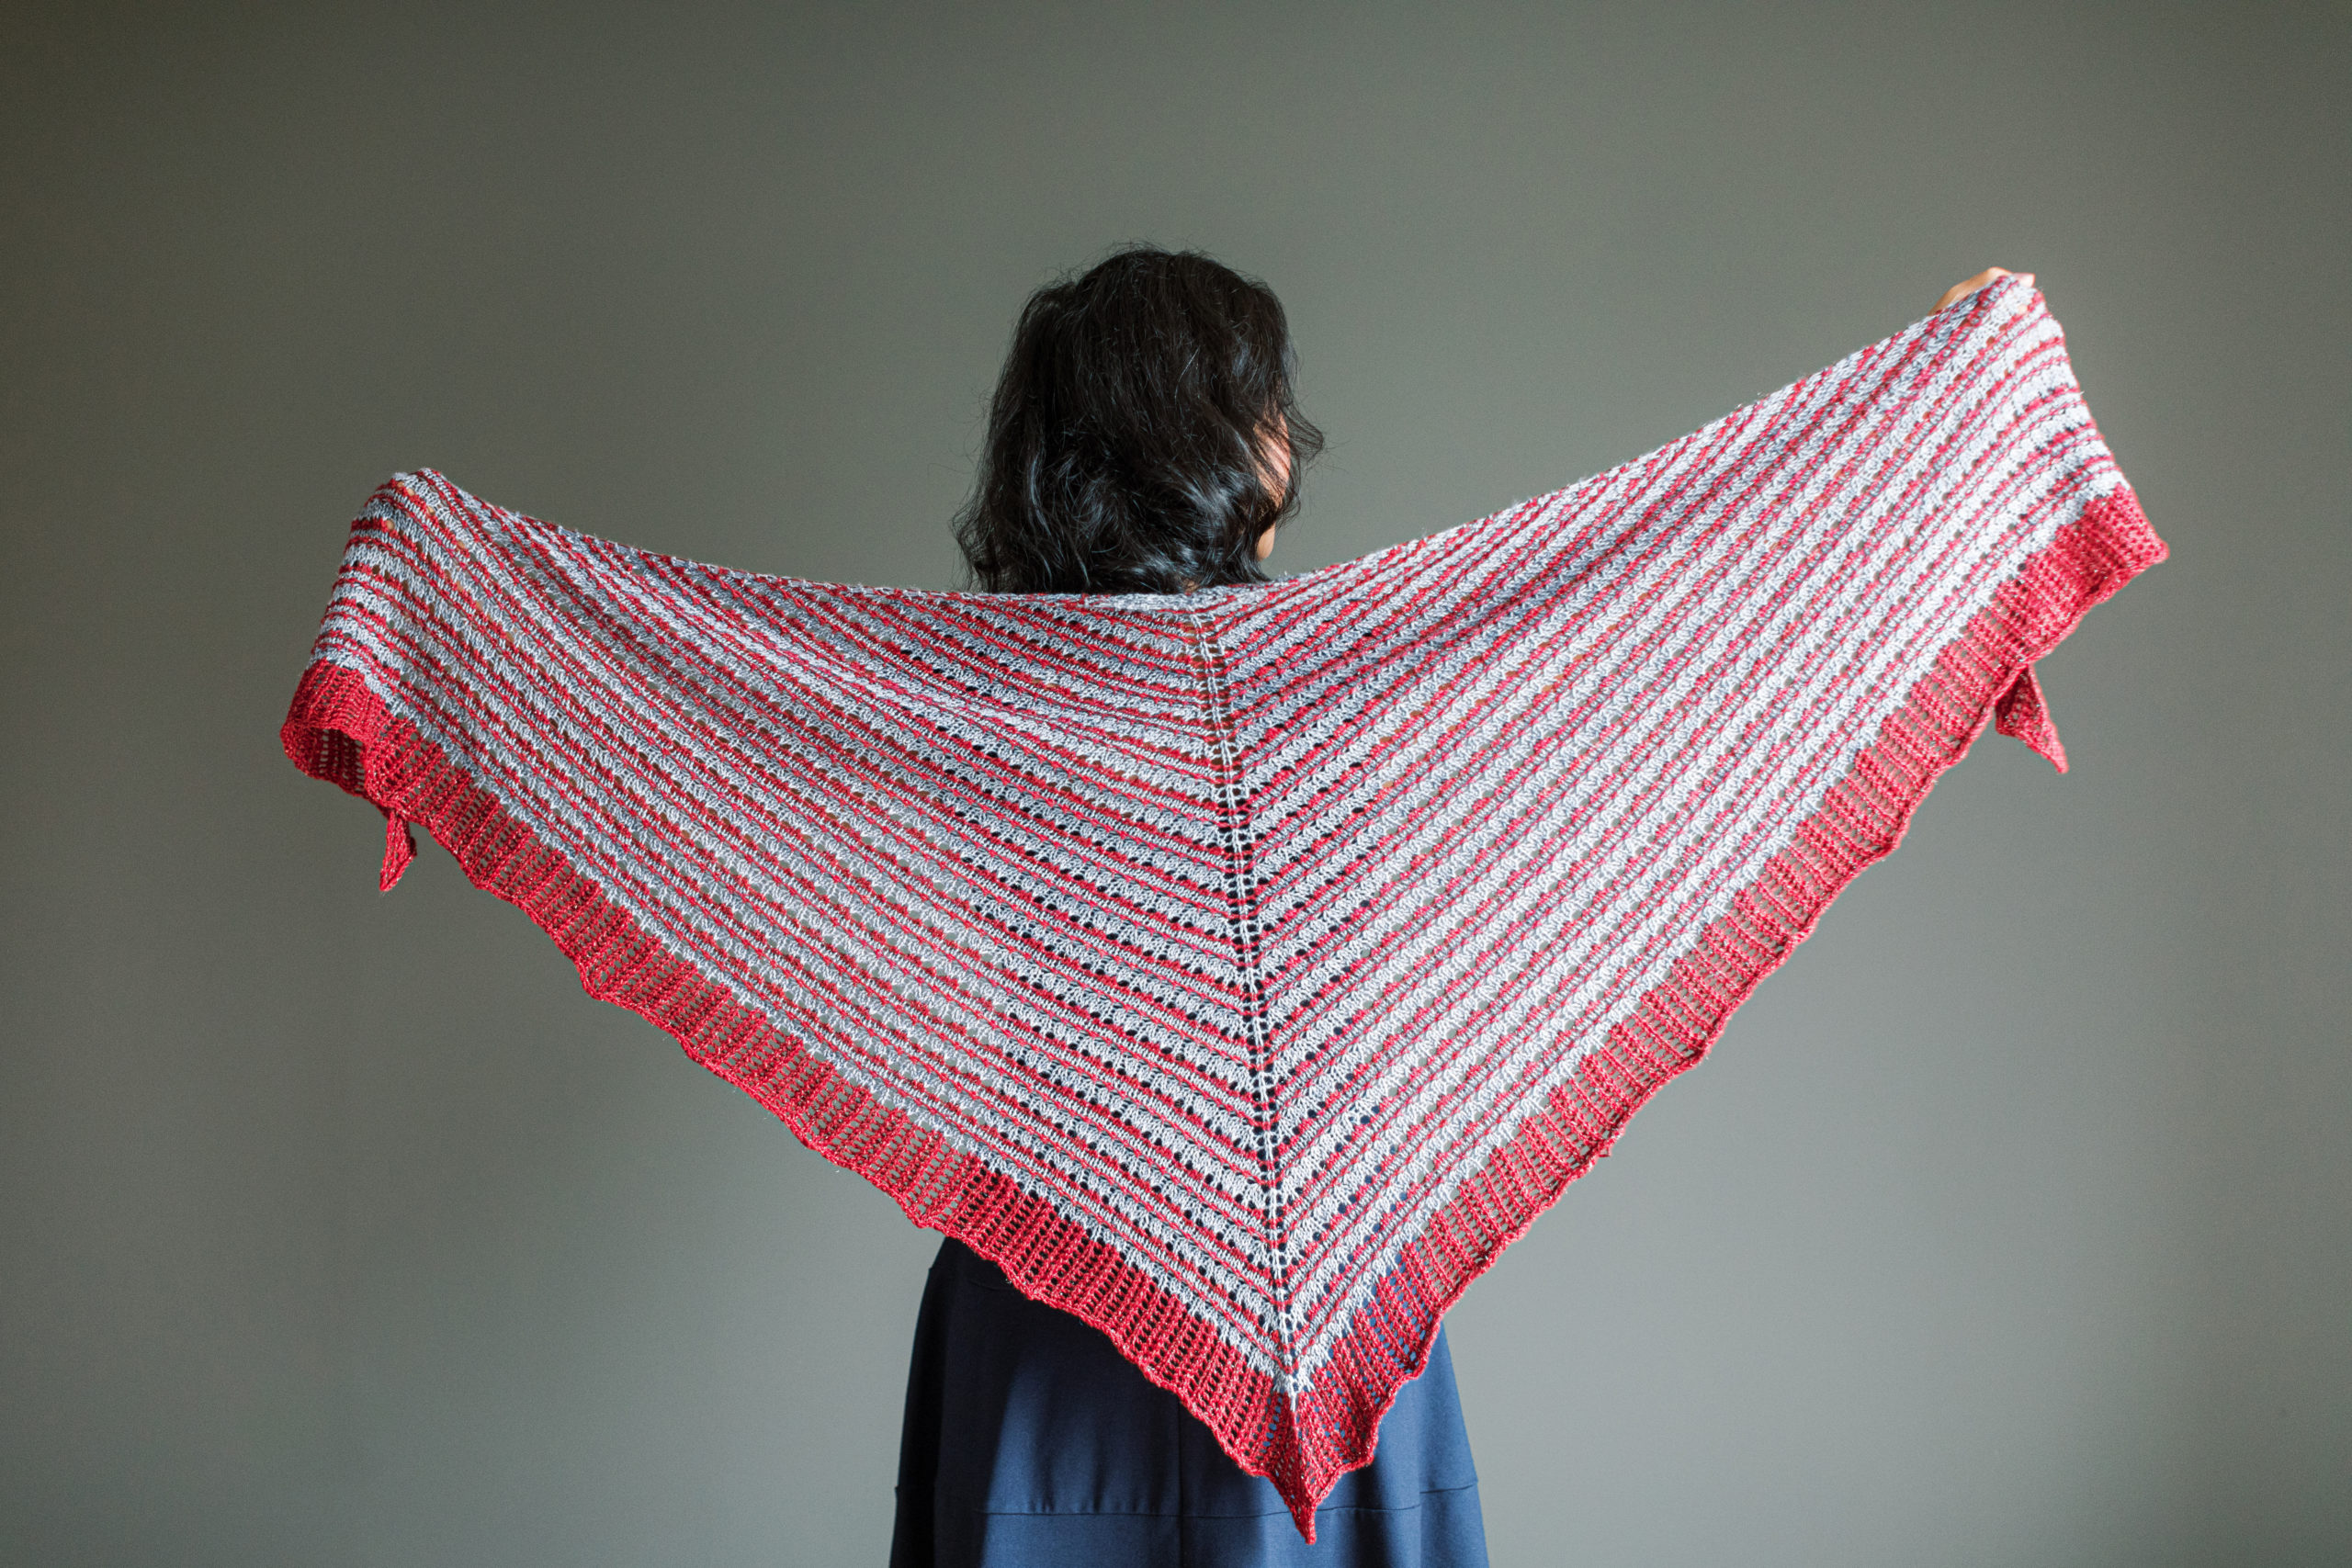 Holidays with SweetGeorgia 2020, Seward Shawl by Tabetha Hedrick, knit in SweetGeorgia Tough Love Sock and CashLuxe Spark